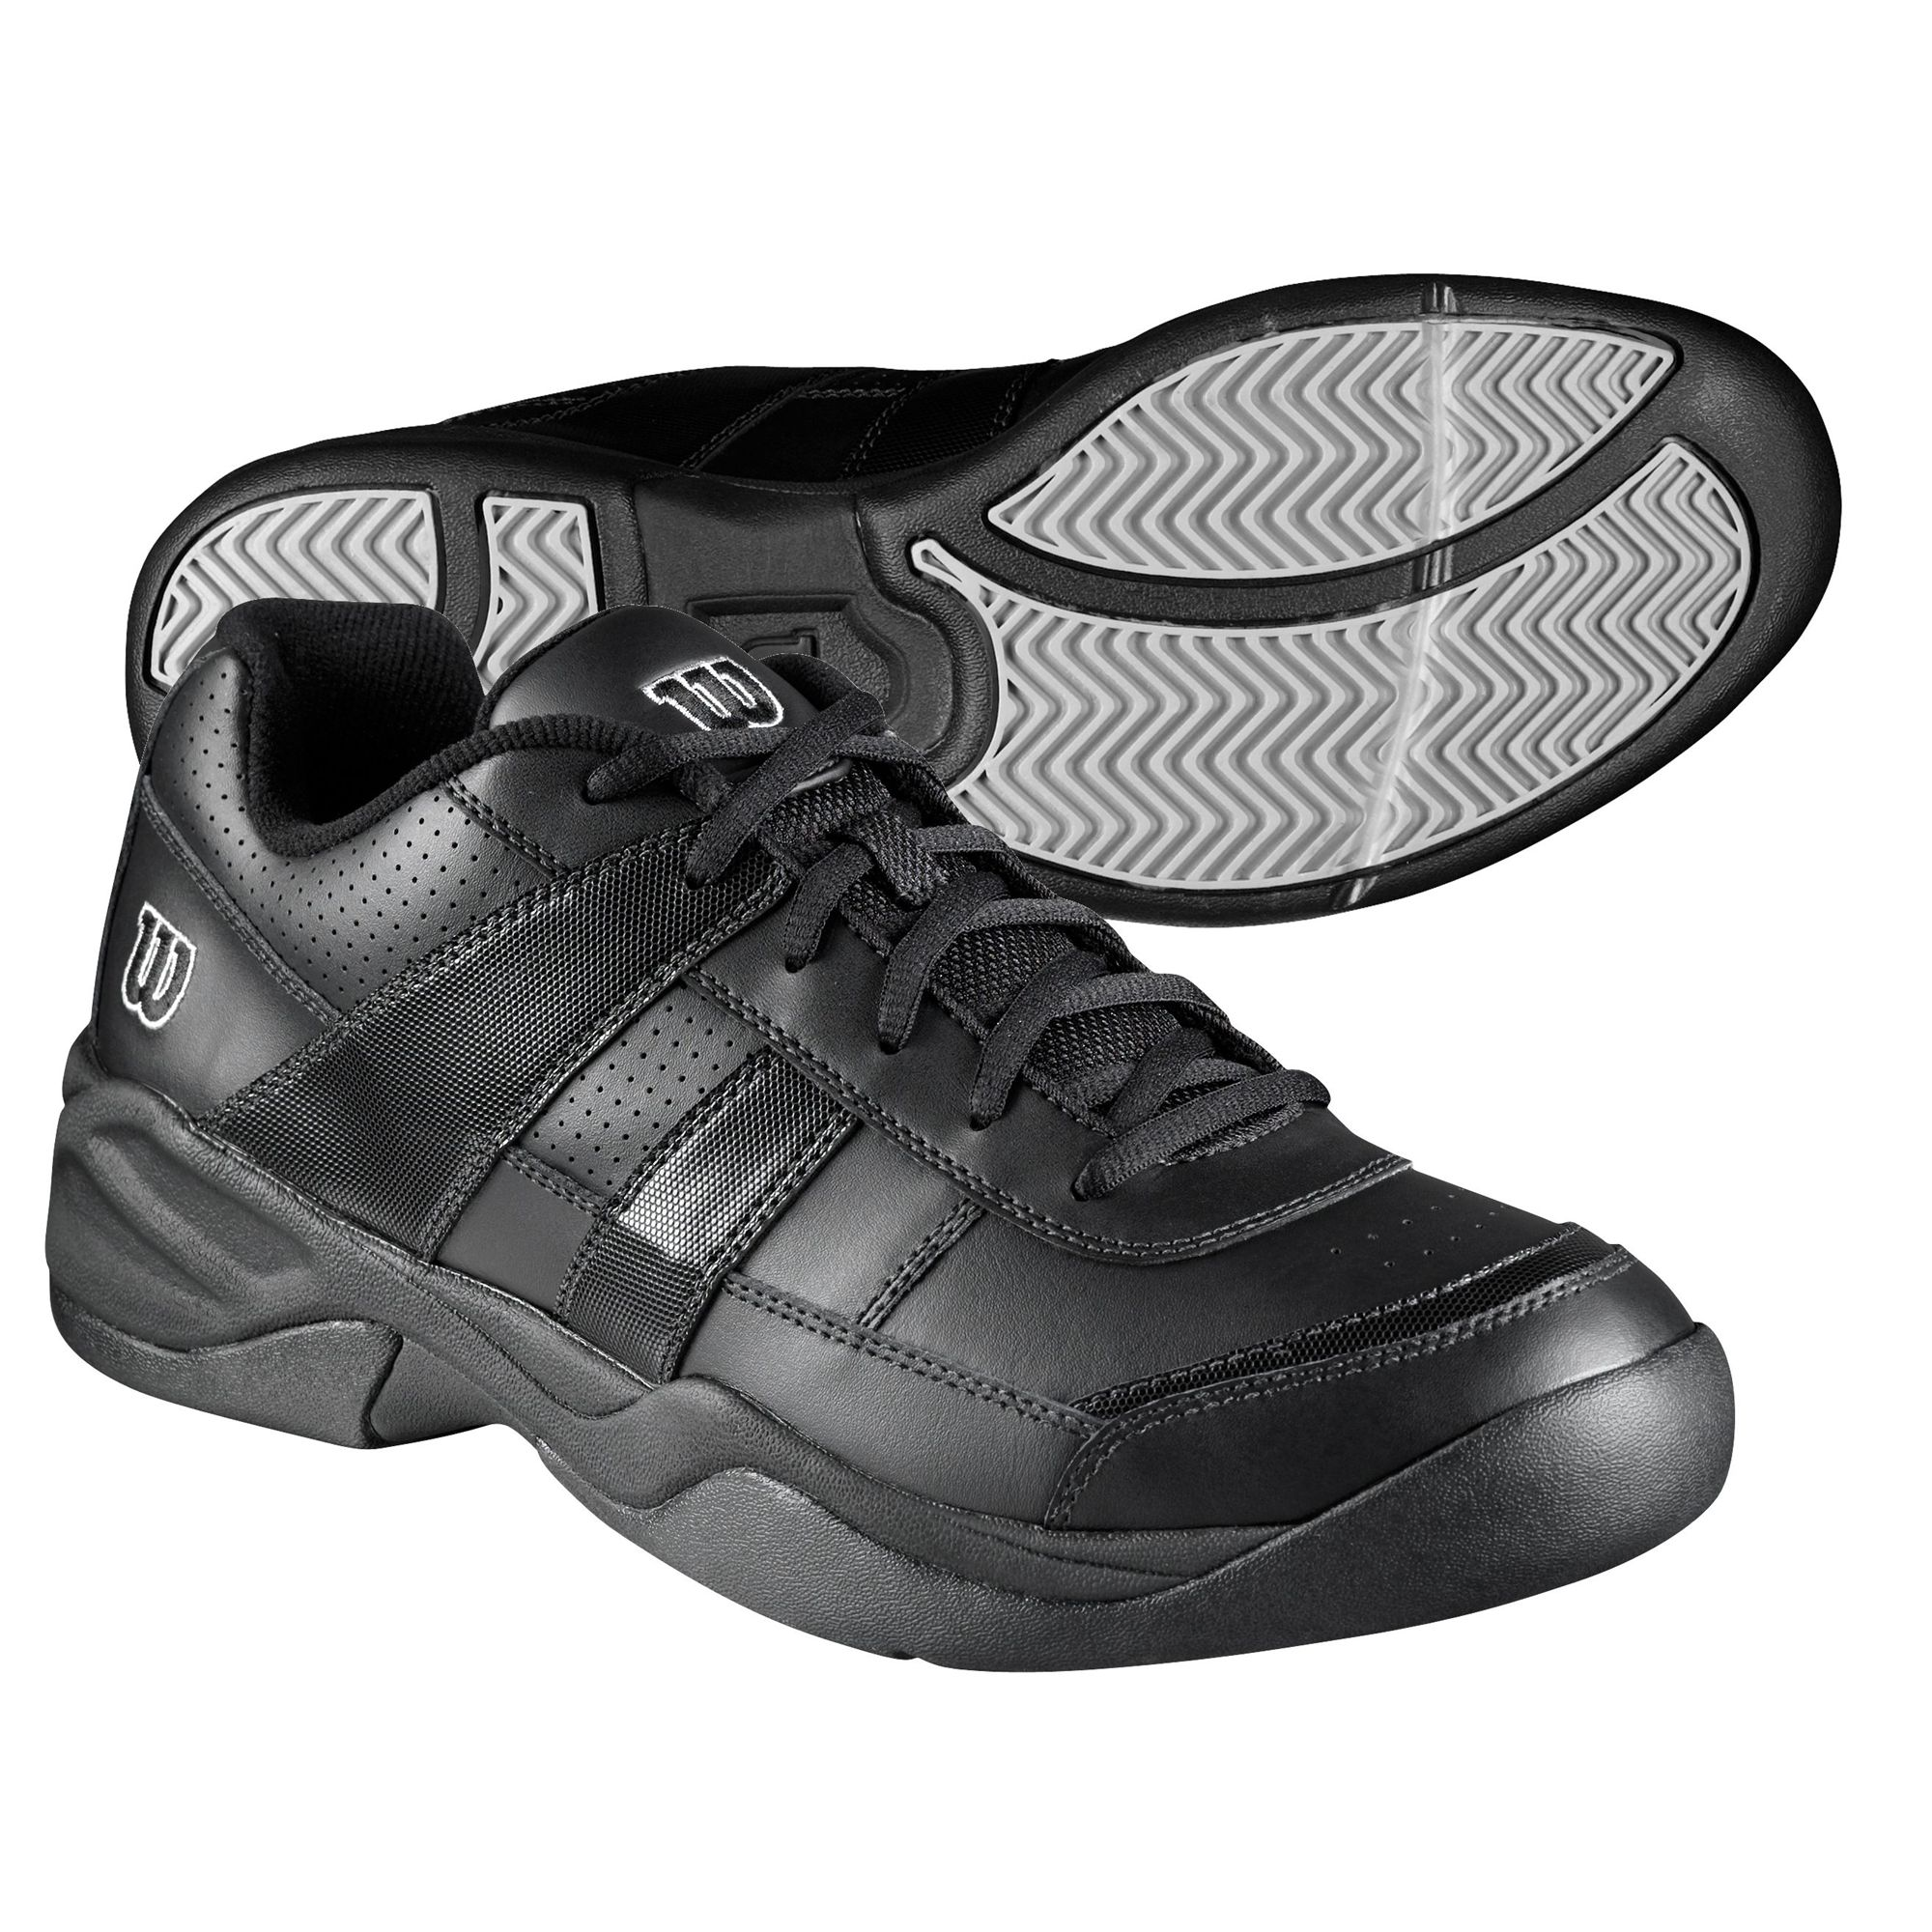 Best Shoes For Outdoor Badminton